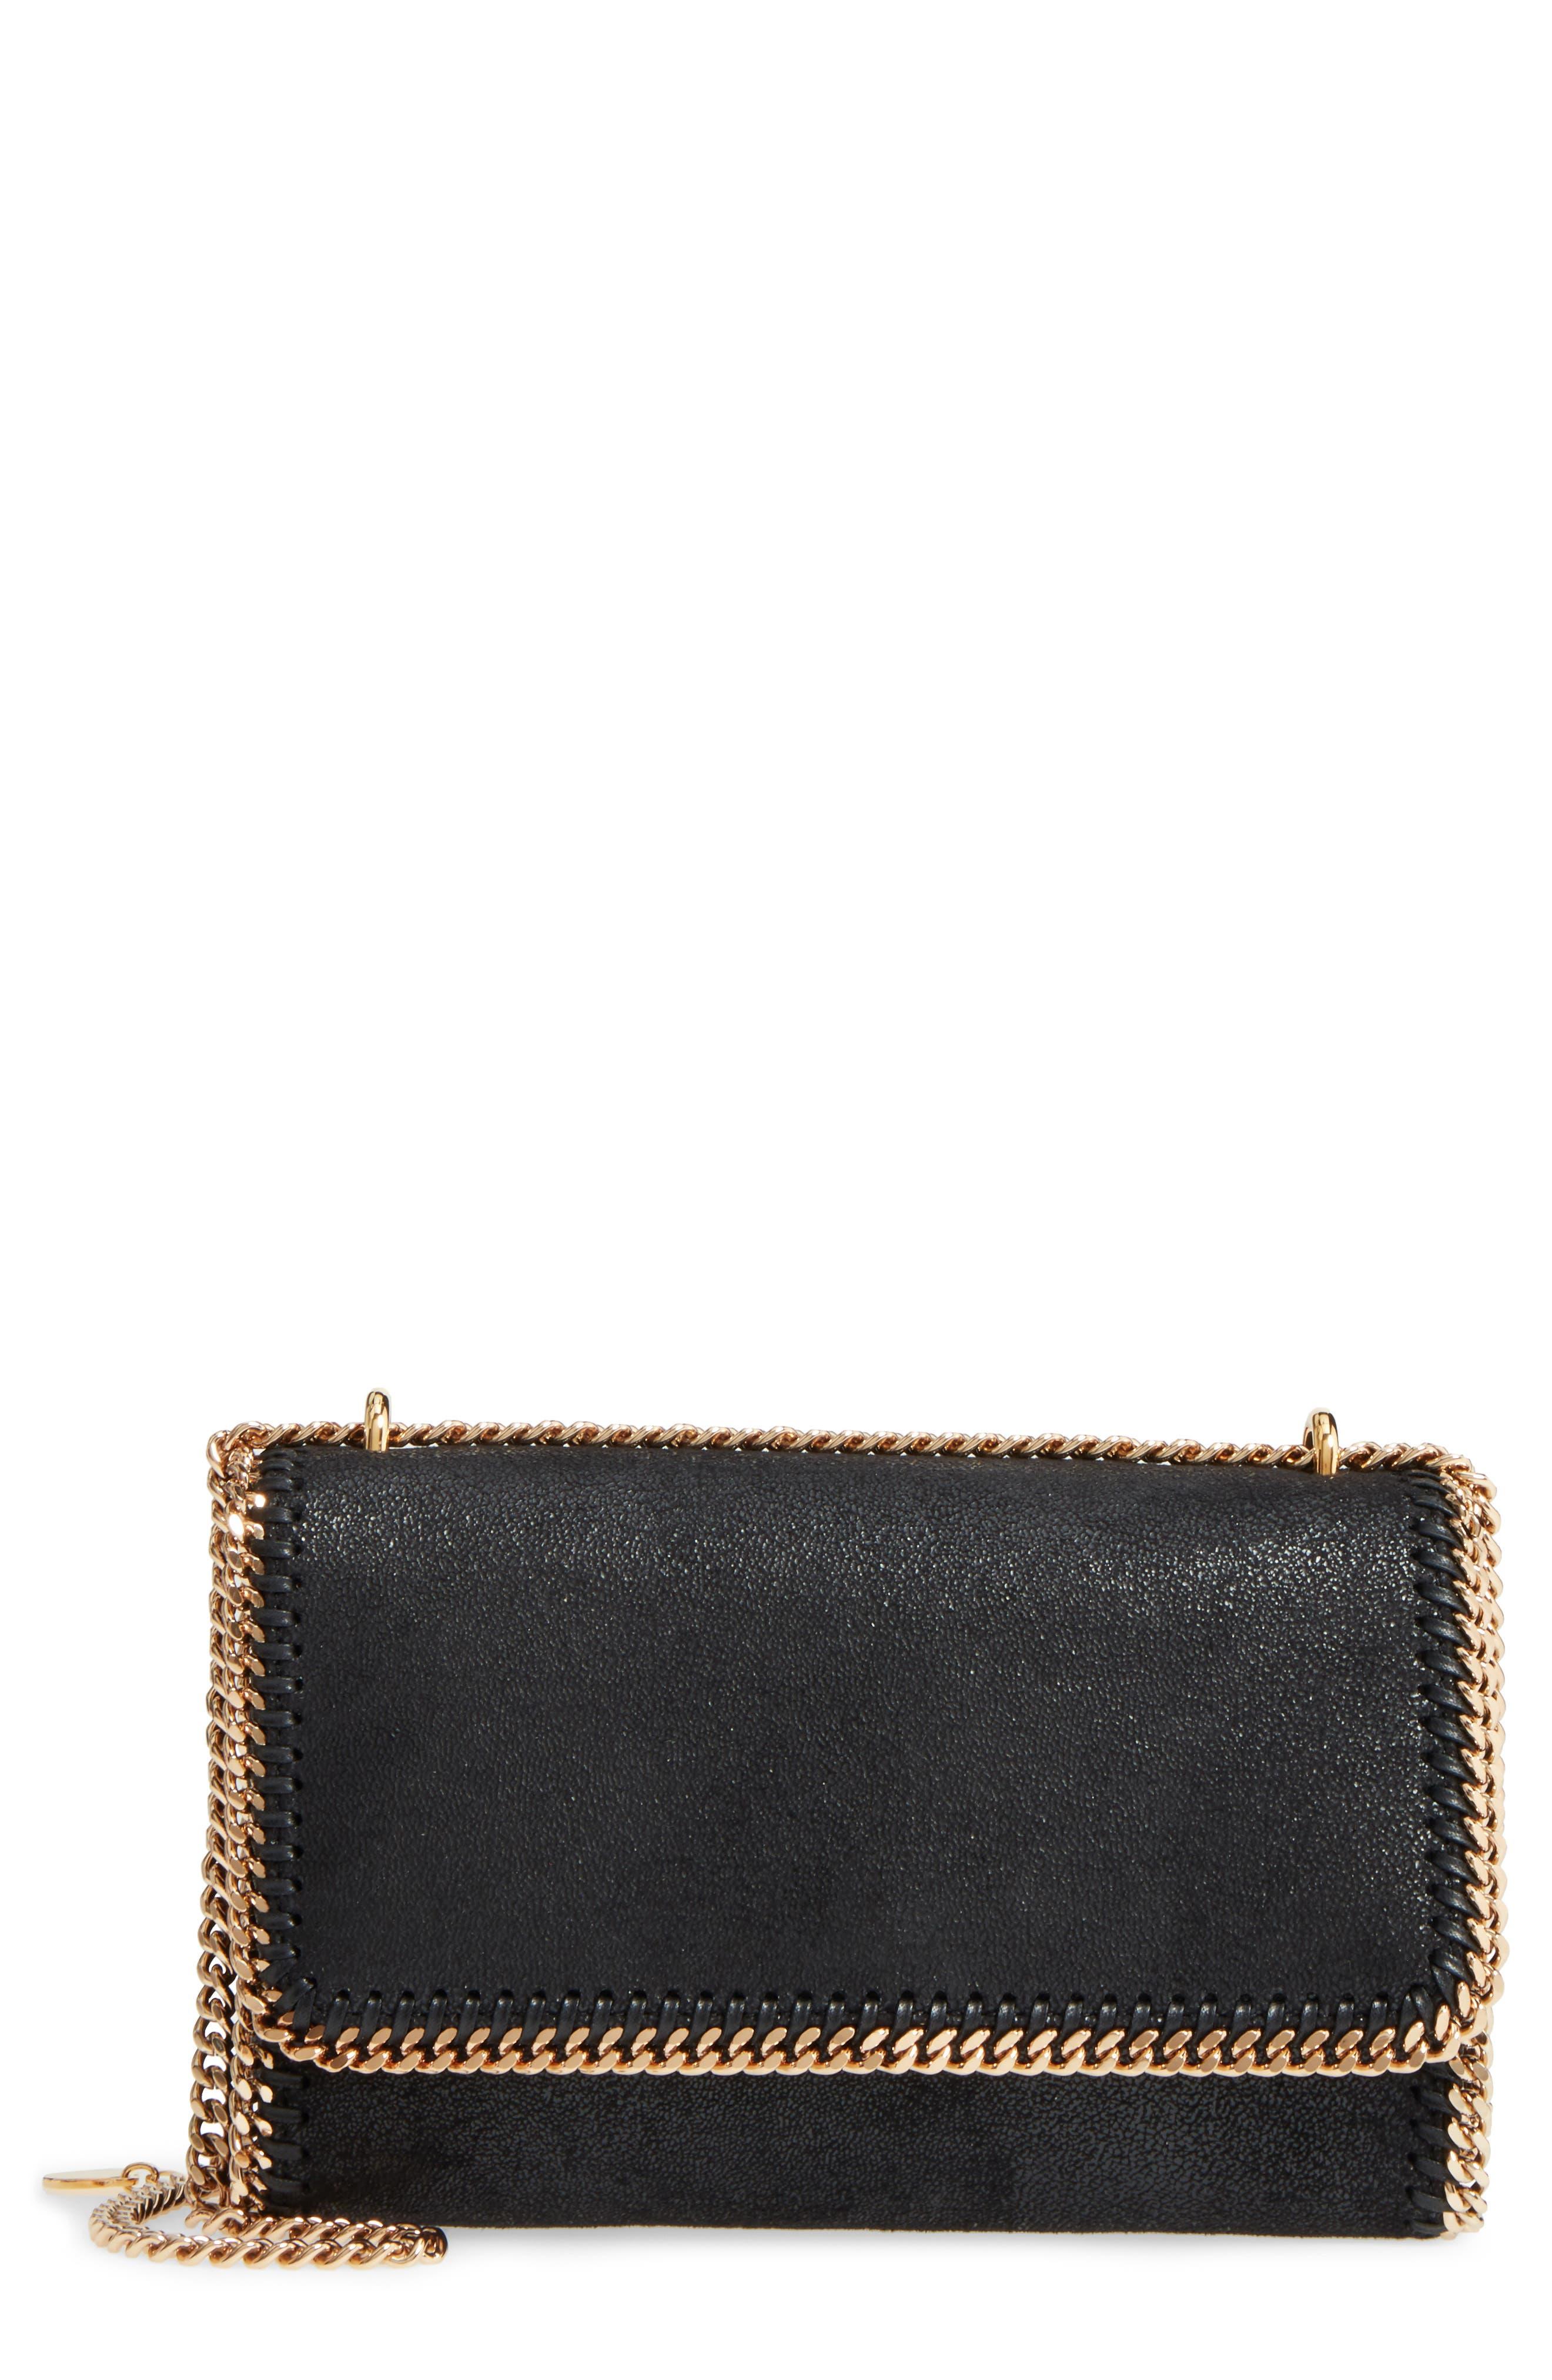 Falabella Shaggy Deer Faux Leather Shoulder Bag,                         Main,                         color, BLACK